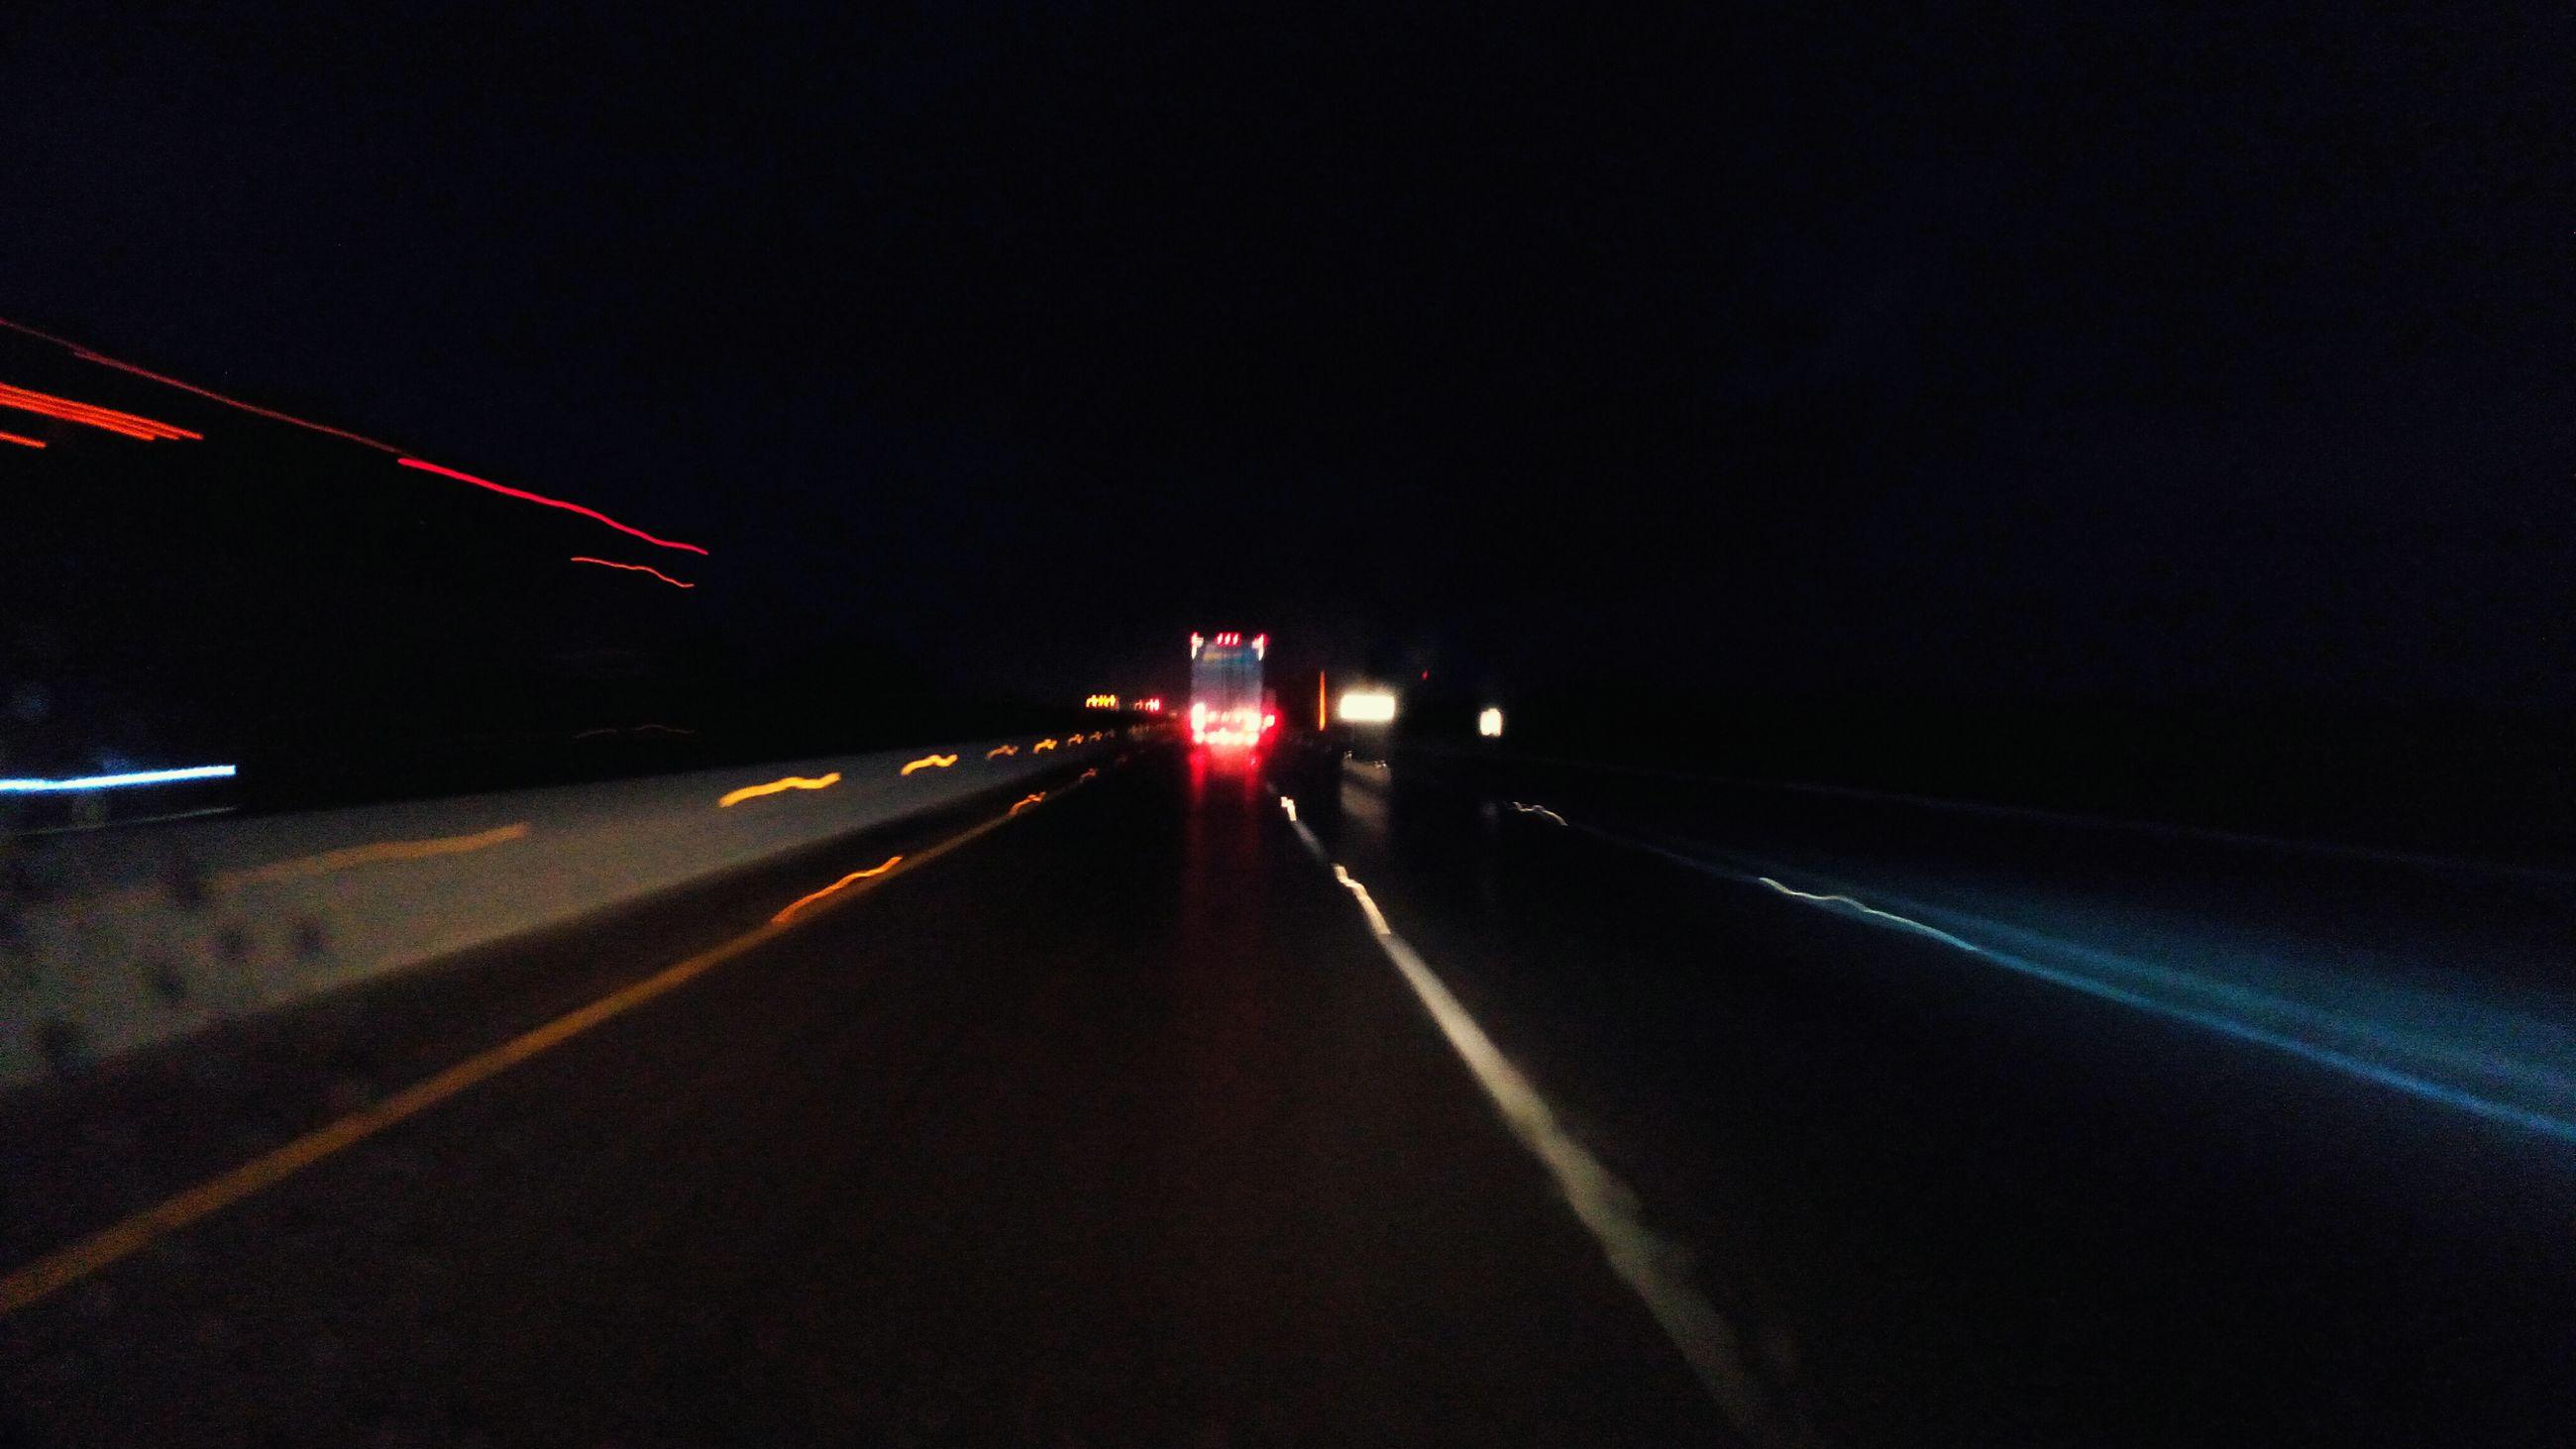 transportation, illuminated, night, the way forward, road, road marking, diminishing perspective, vanishing point, light trail, no people, empty, outdoors, dark